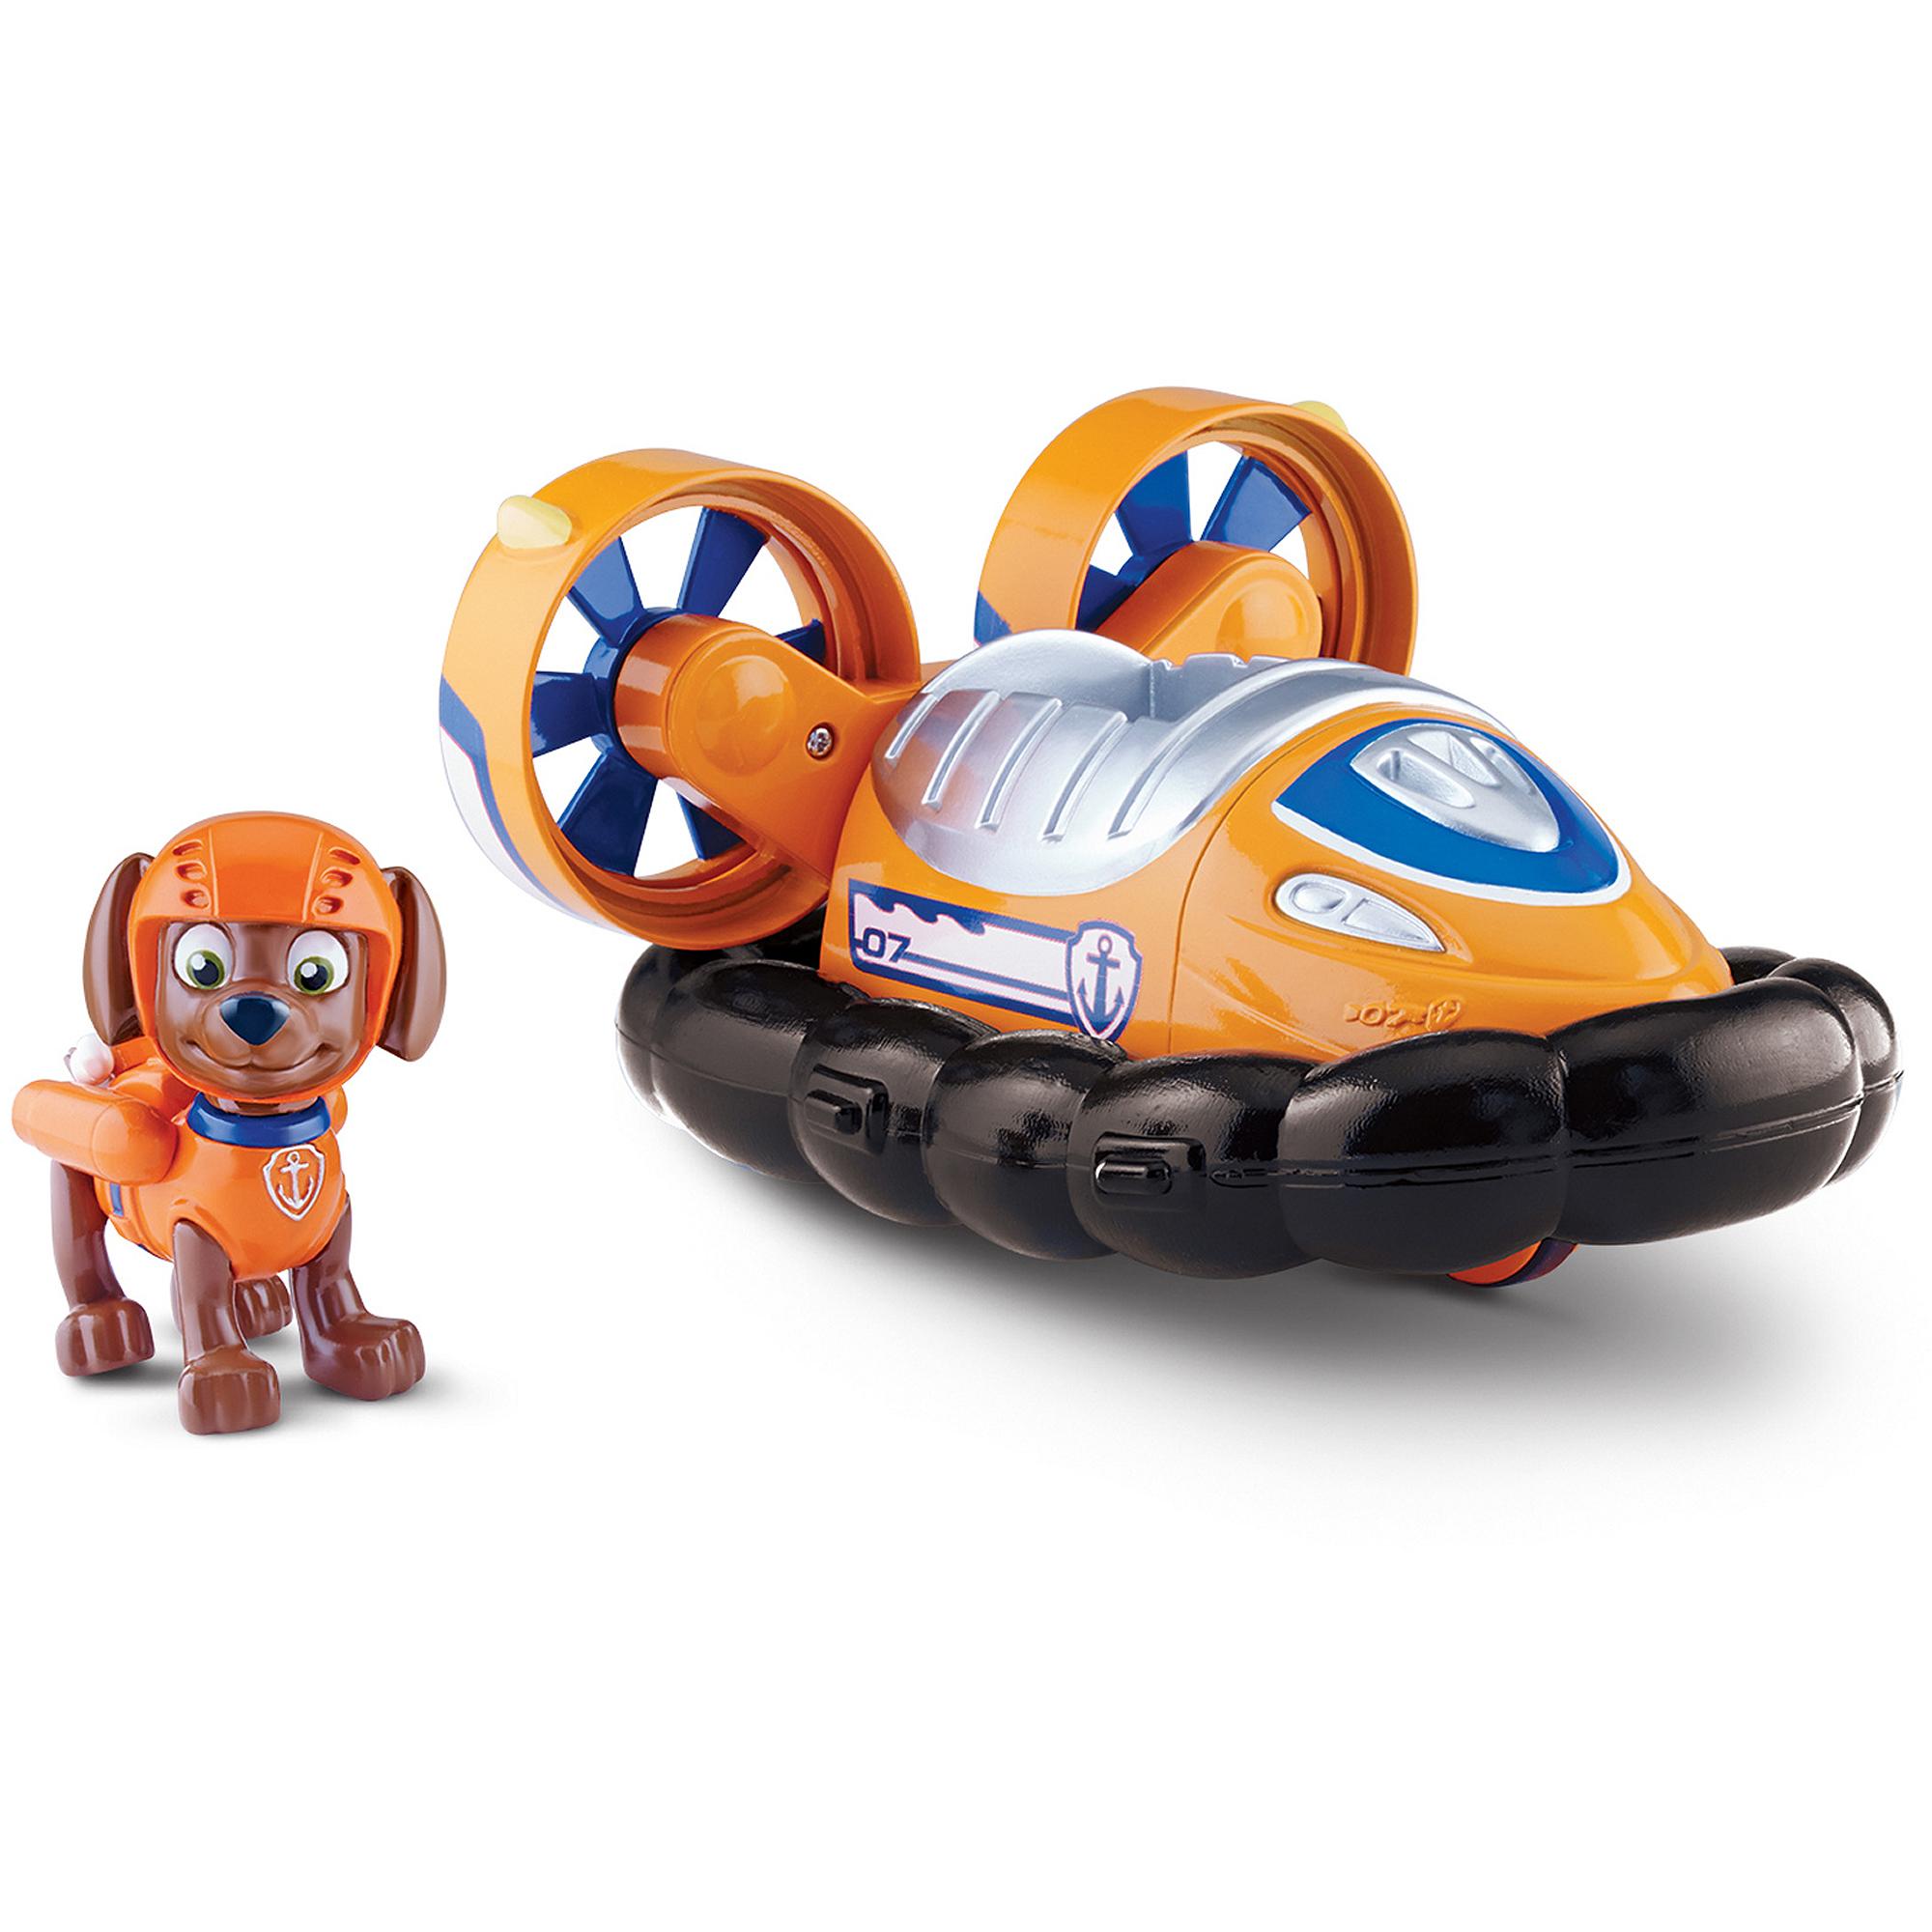 Paw Patrol - Zuma's Hovercraft, Vehicle and Figure